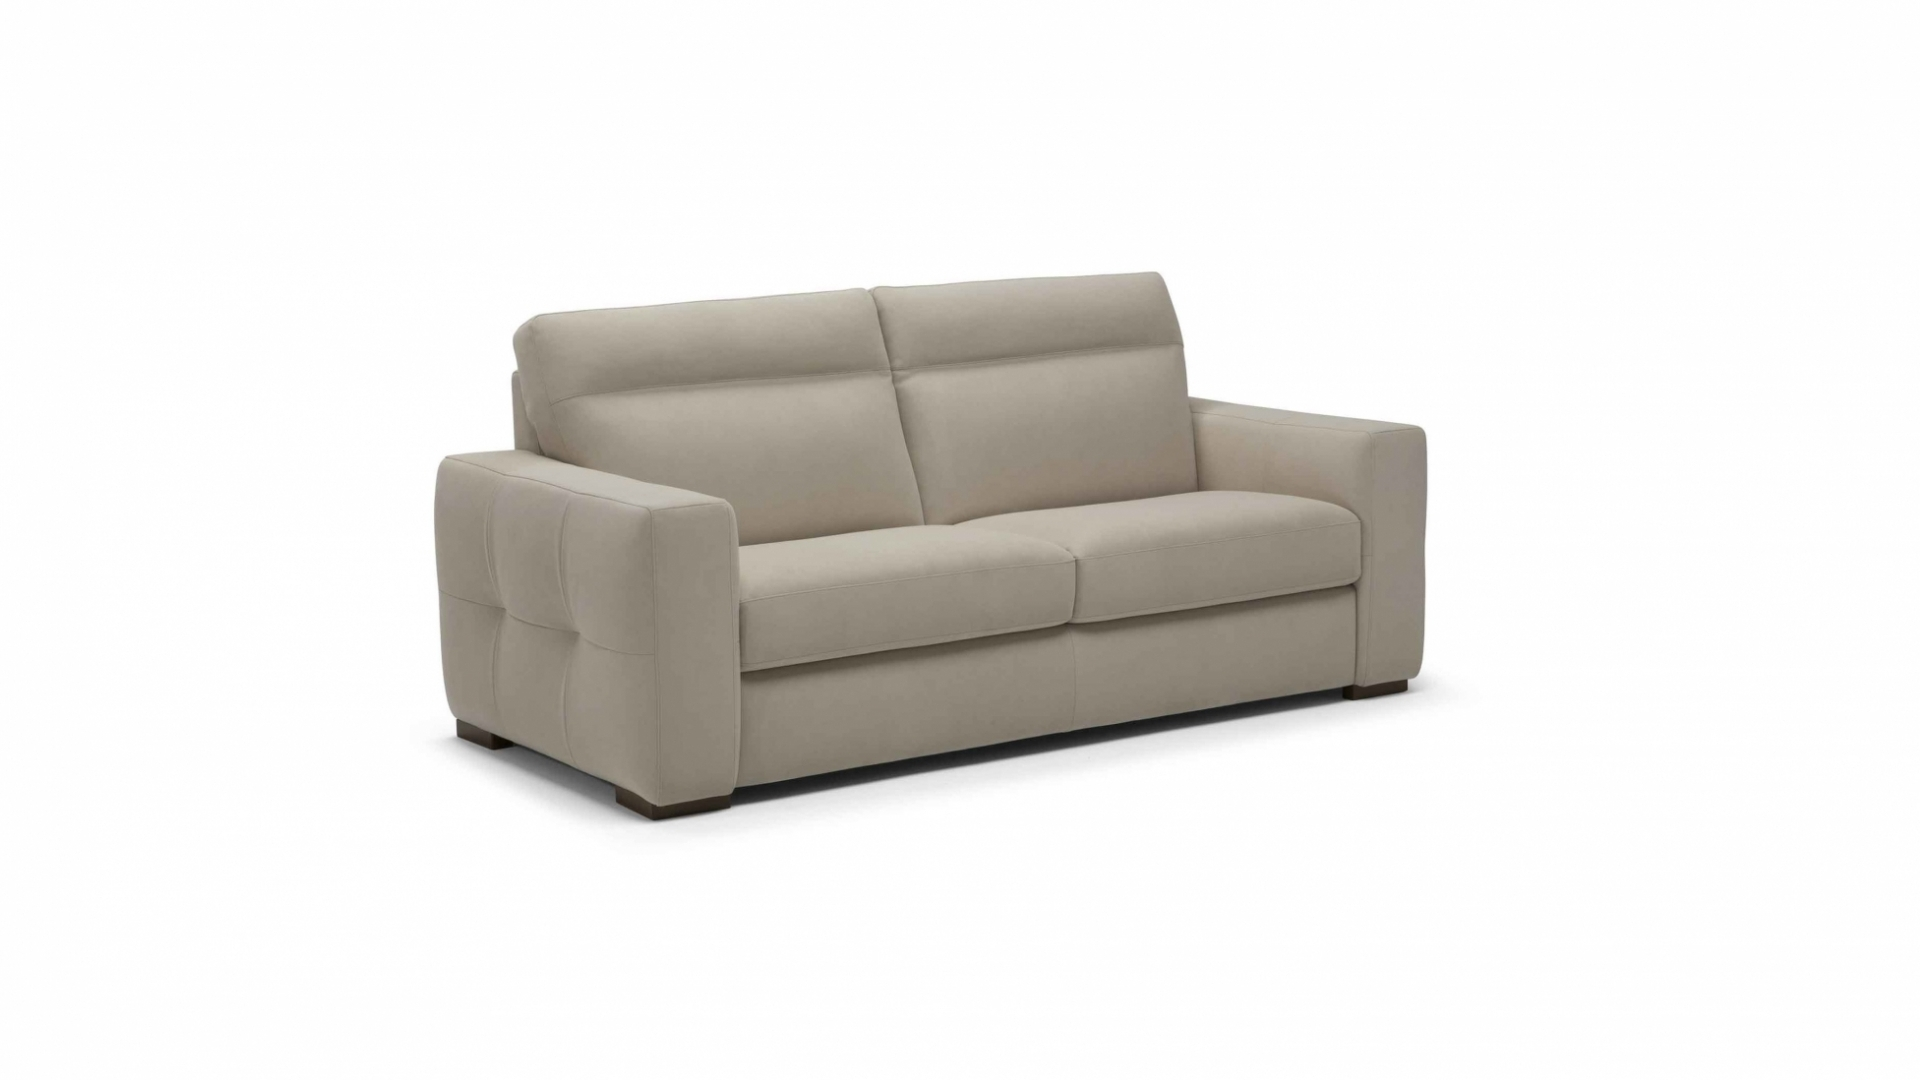 Enea  Sofa beds